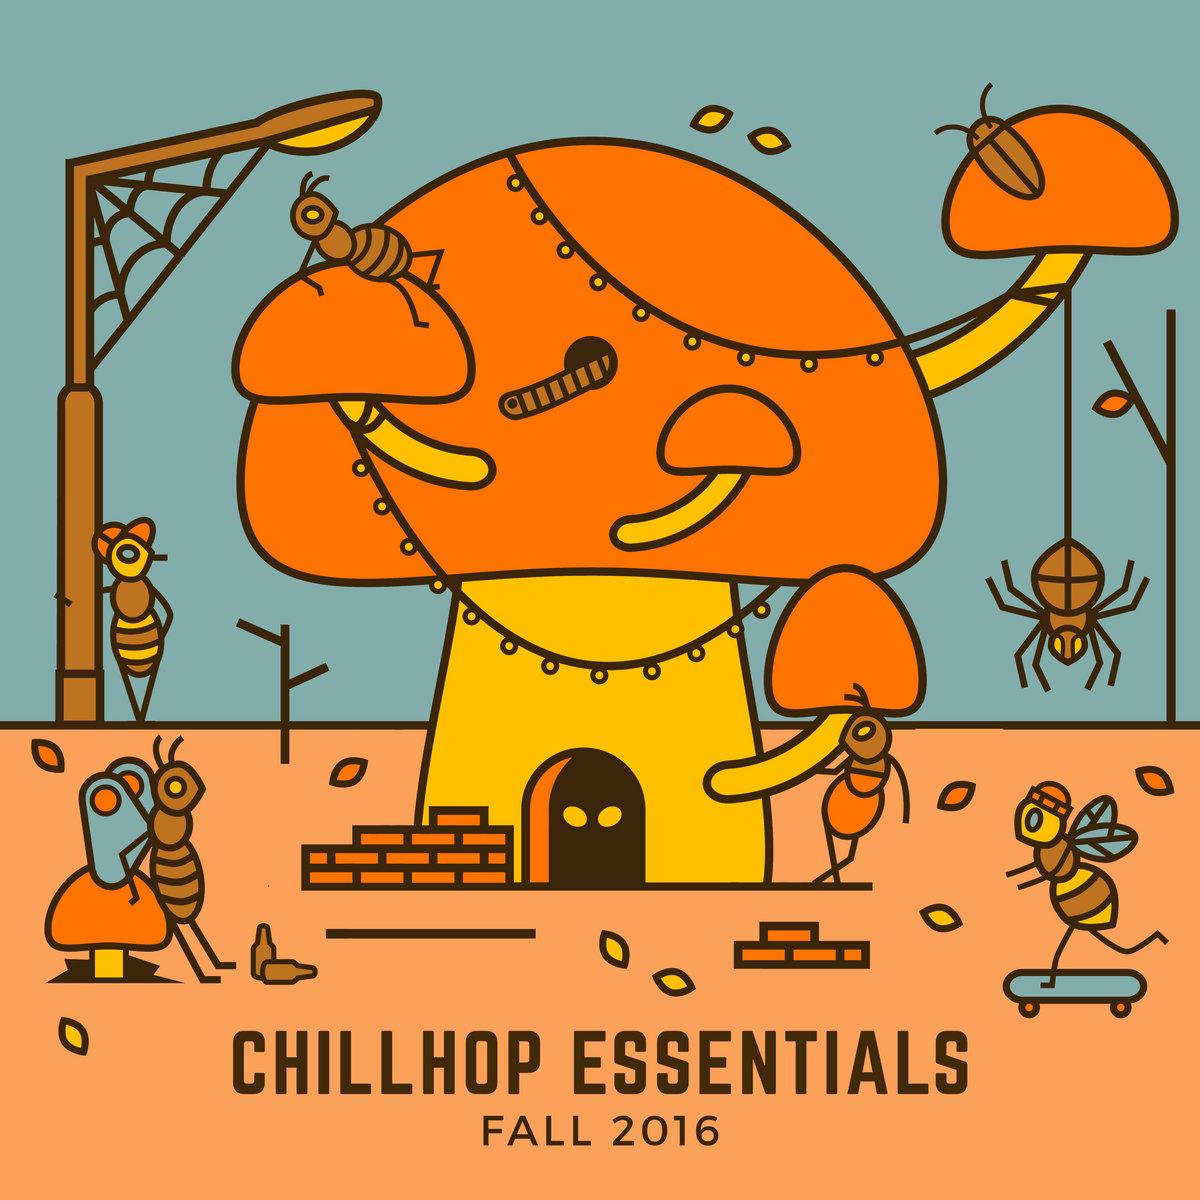 Chillhop Essentials - Fall 2016 | Chillhop Records